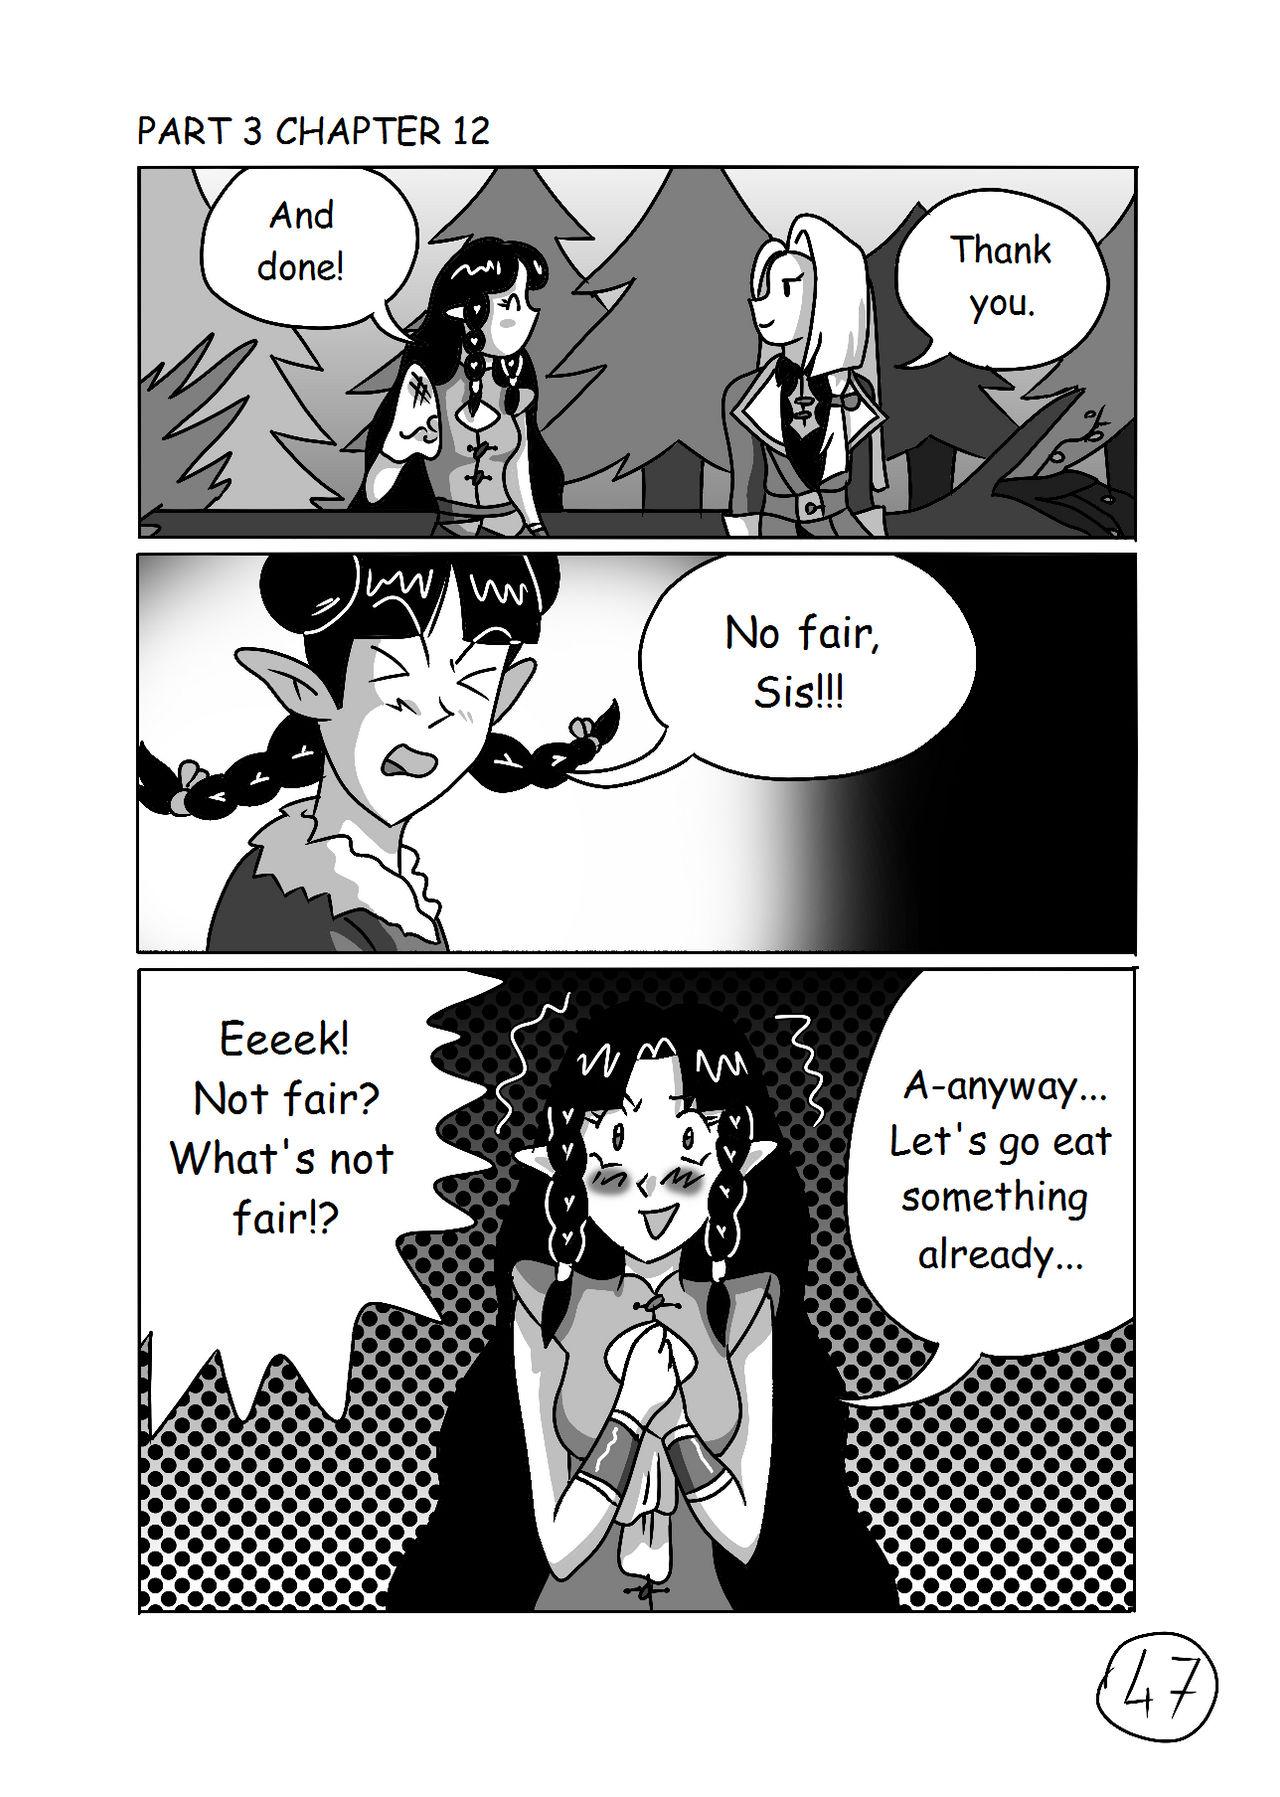 Utsukishi Rosaura Part3 Chapter12 Page47